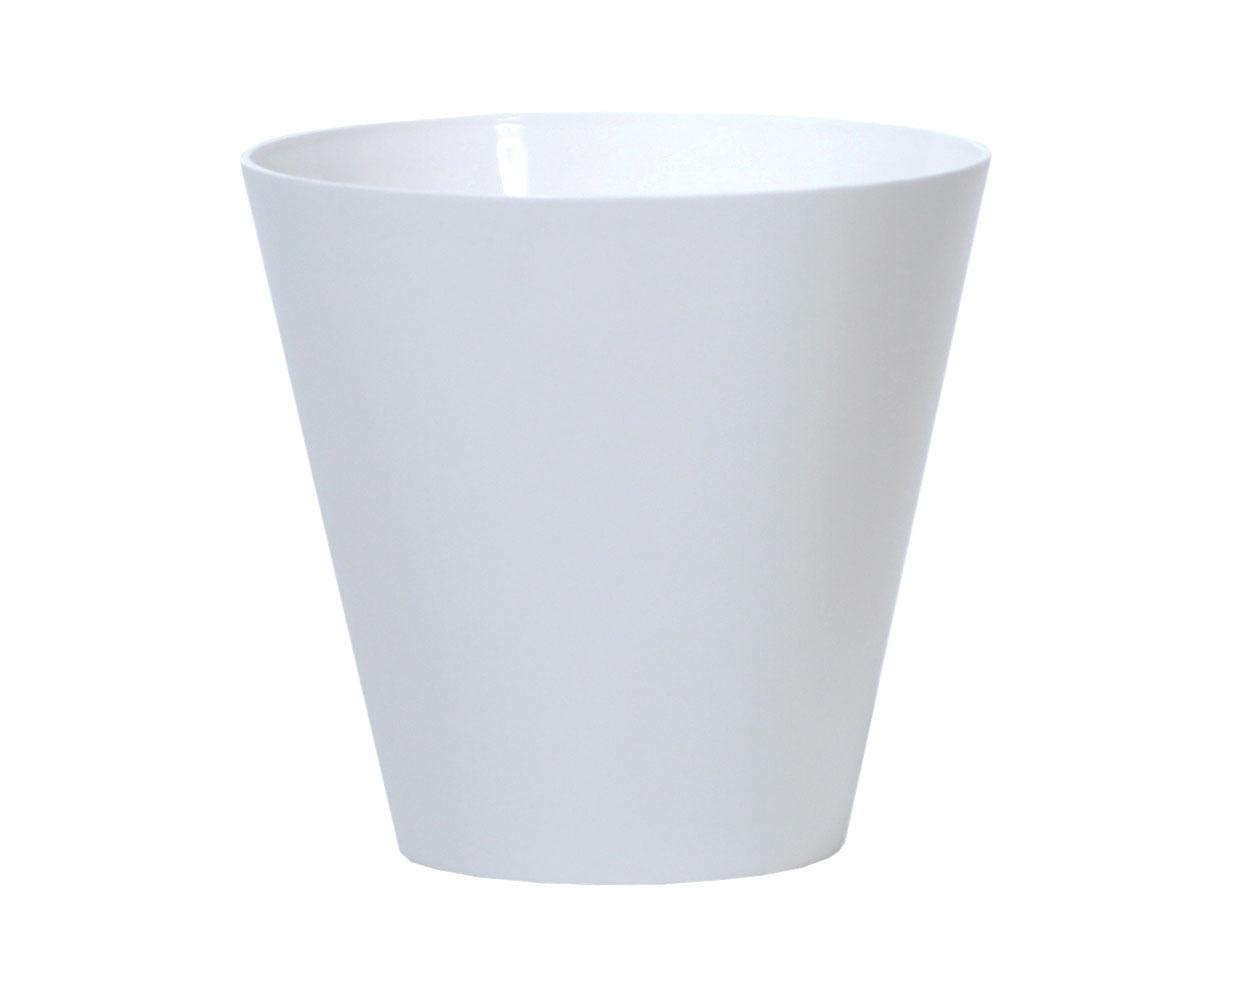 PROSPERPLAST Květináč TUBUS bílý 30,0cm